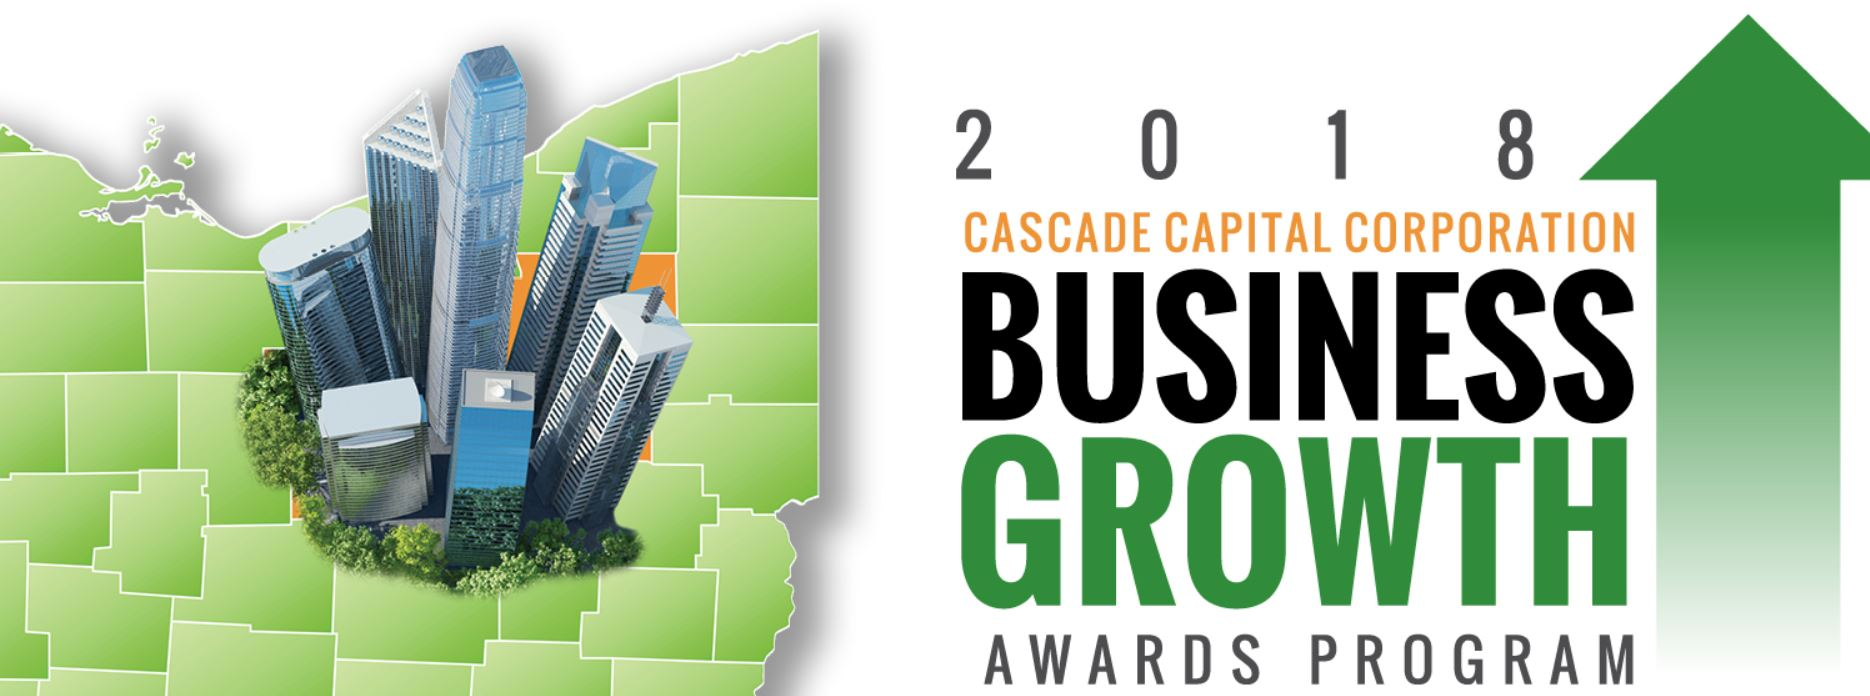 razorleaf named 2018 cascade capital corporation business growth honoree